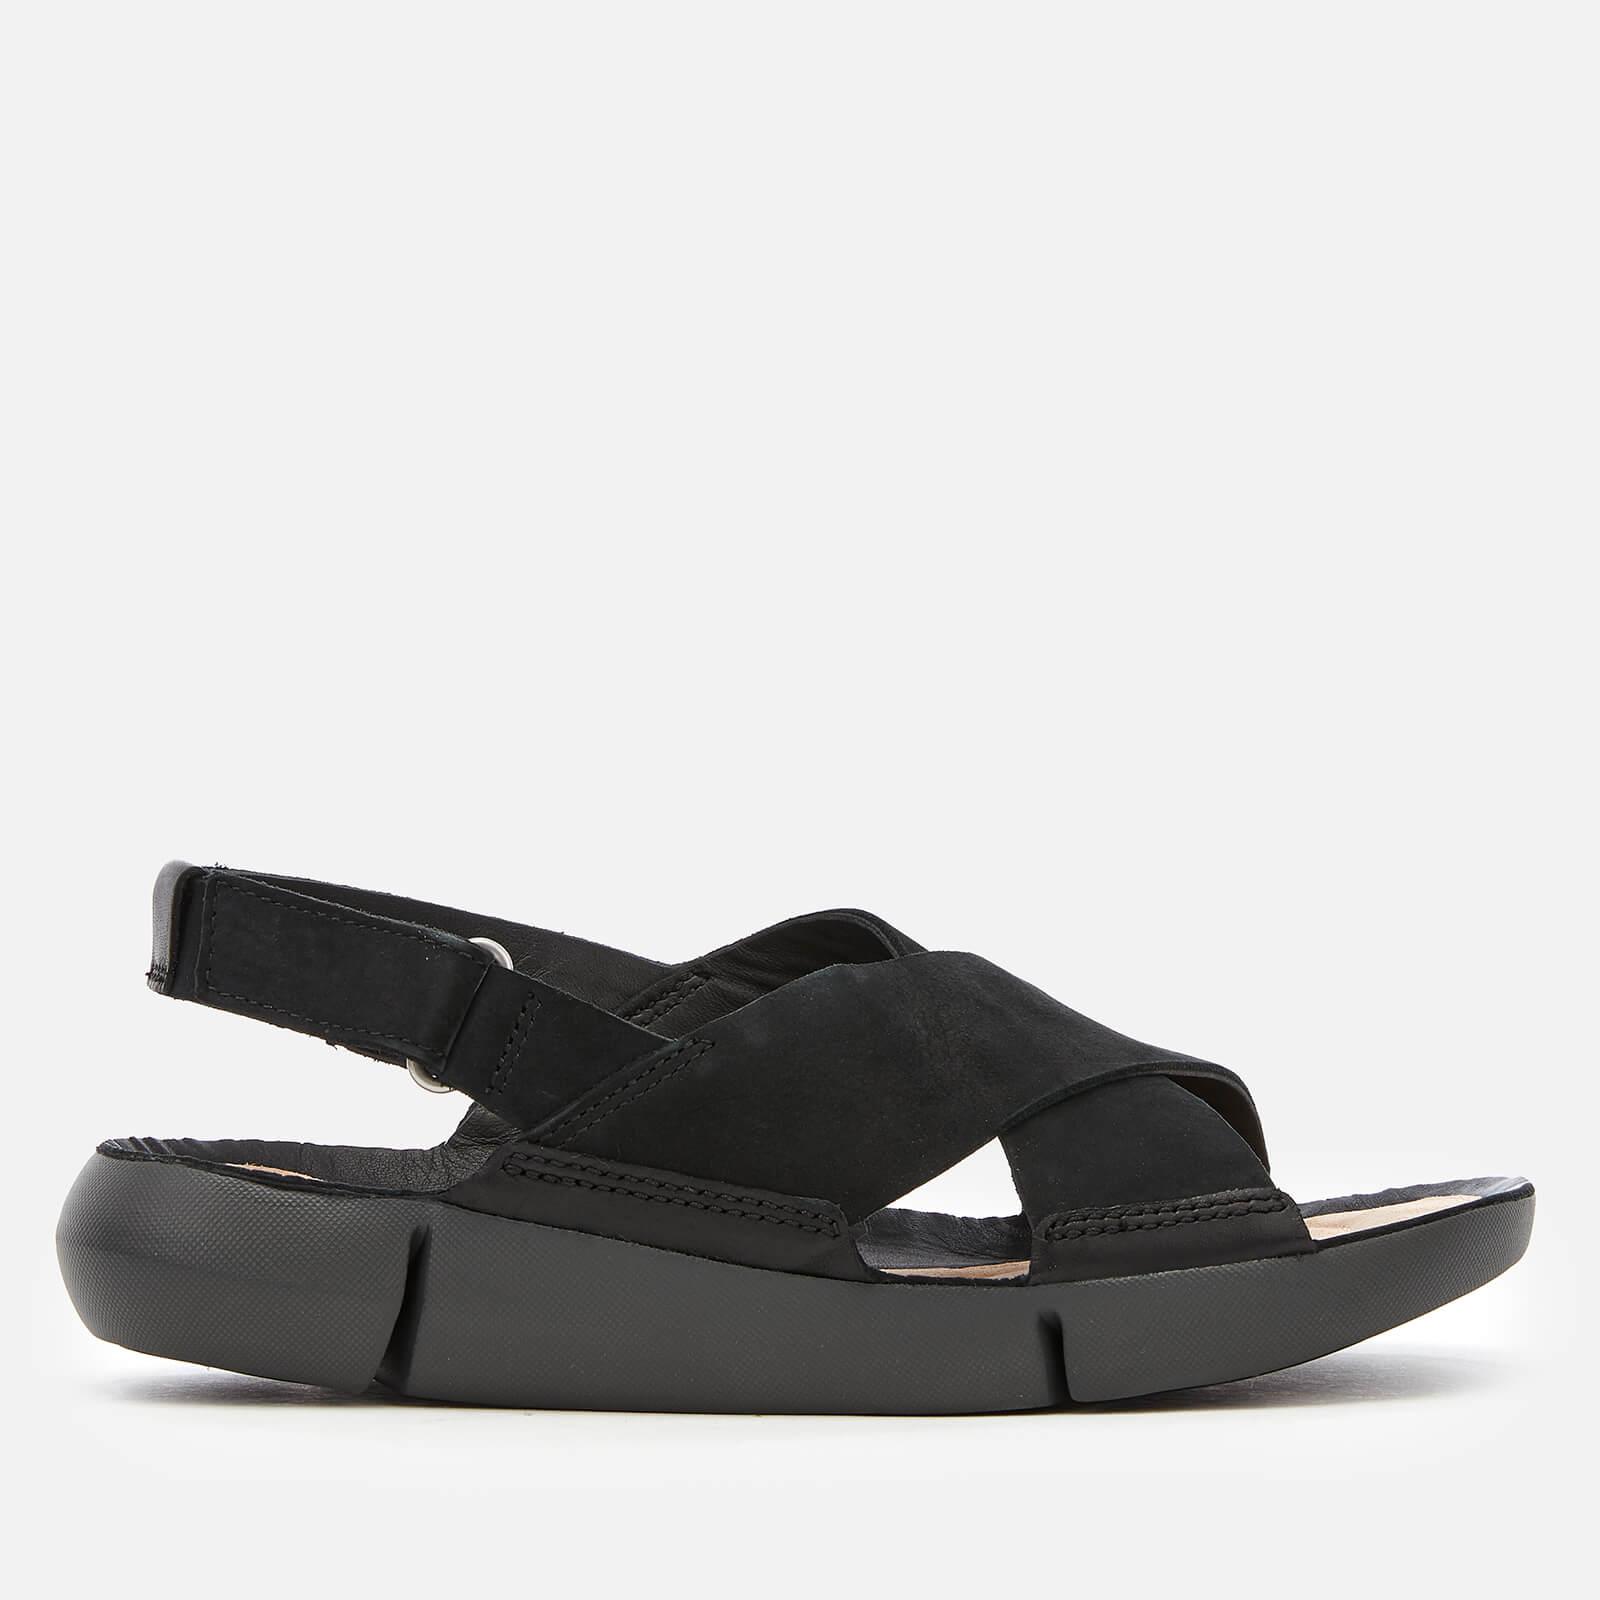 Clarks Women s Tri Chloe Cross Strap Sandals - Black Combi Womens ...